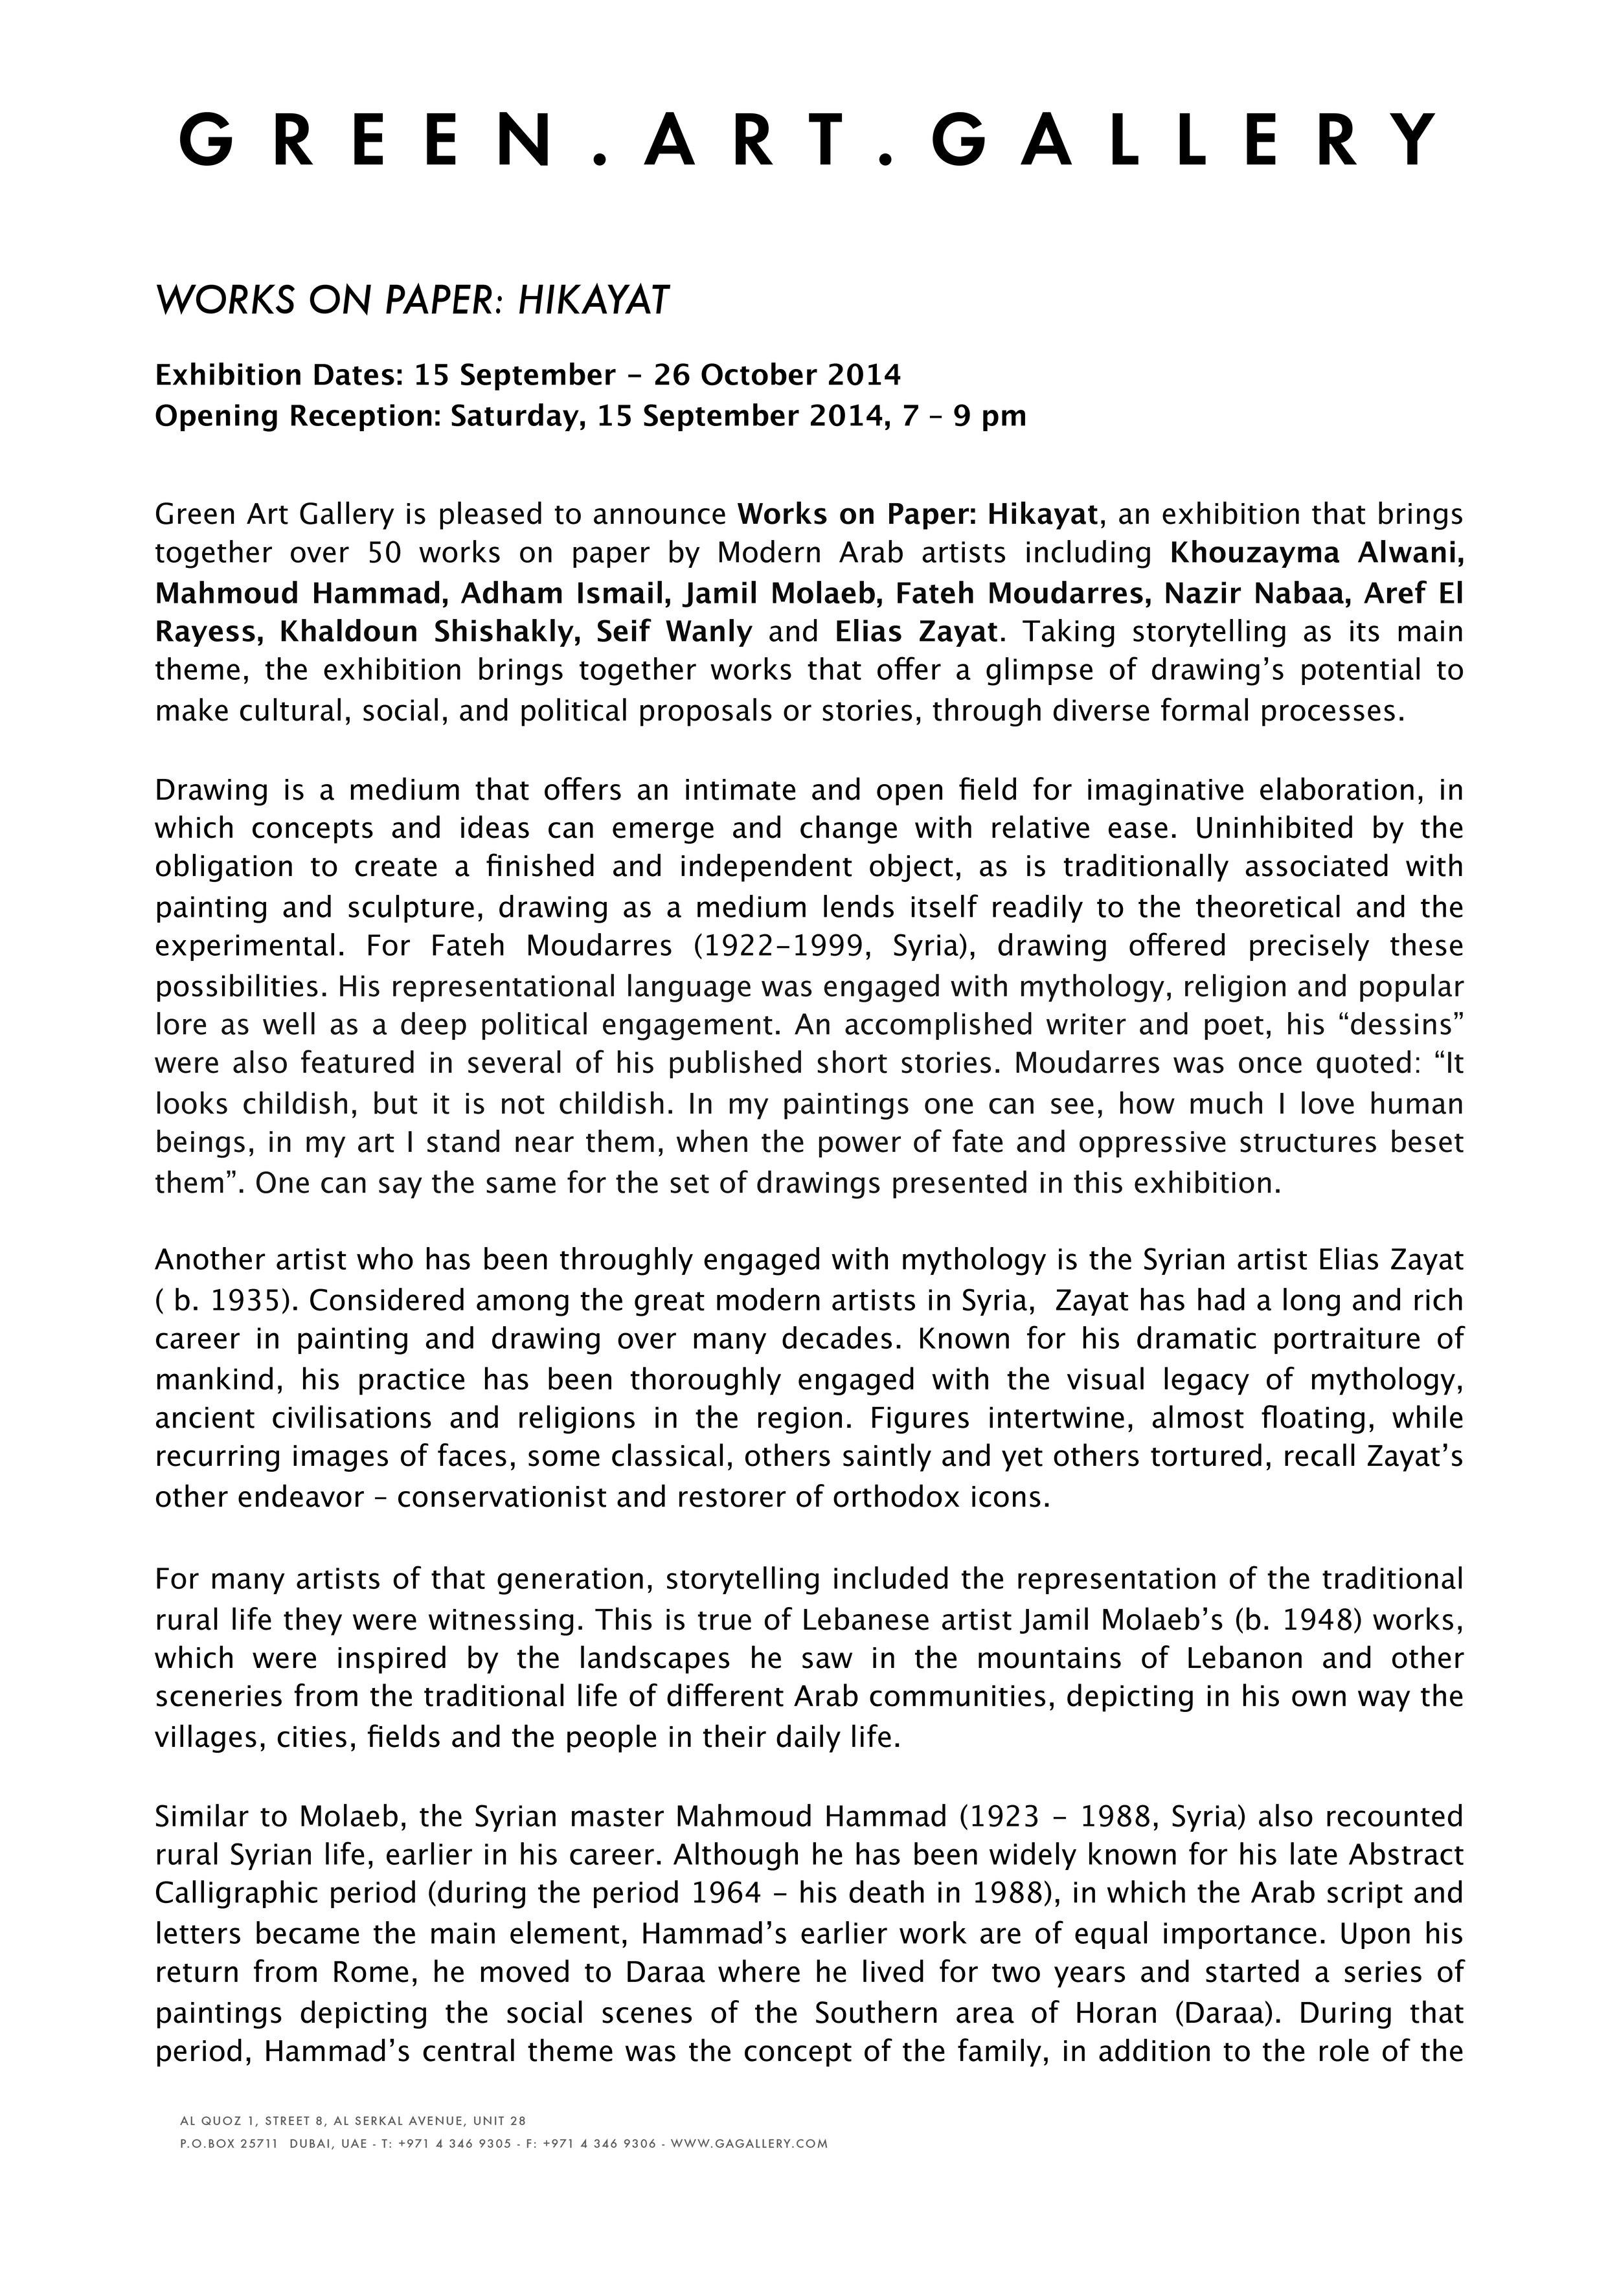 Press release. Green Art Gallery, HIKAYAT 2014